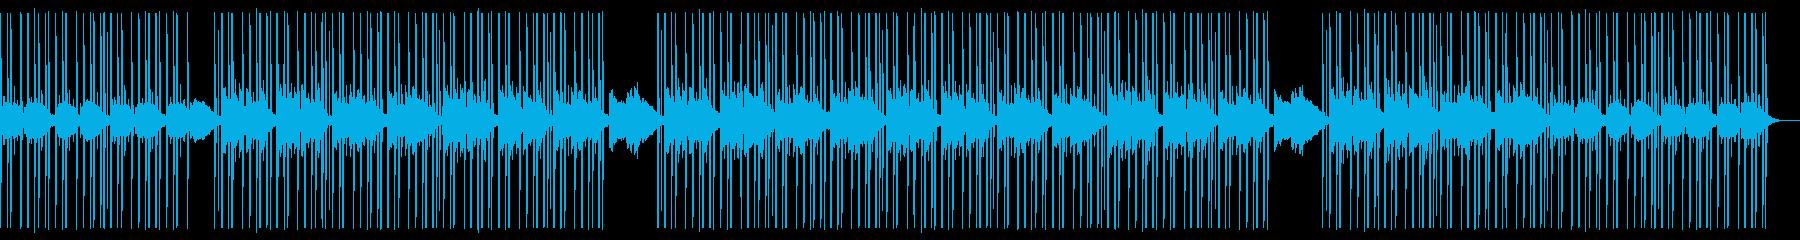 Lofi Hiphop 公園トランペットの再生済みの波形